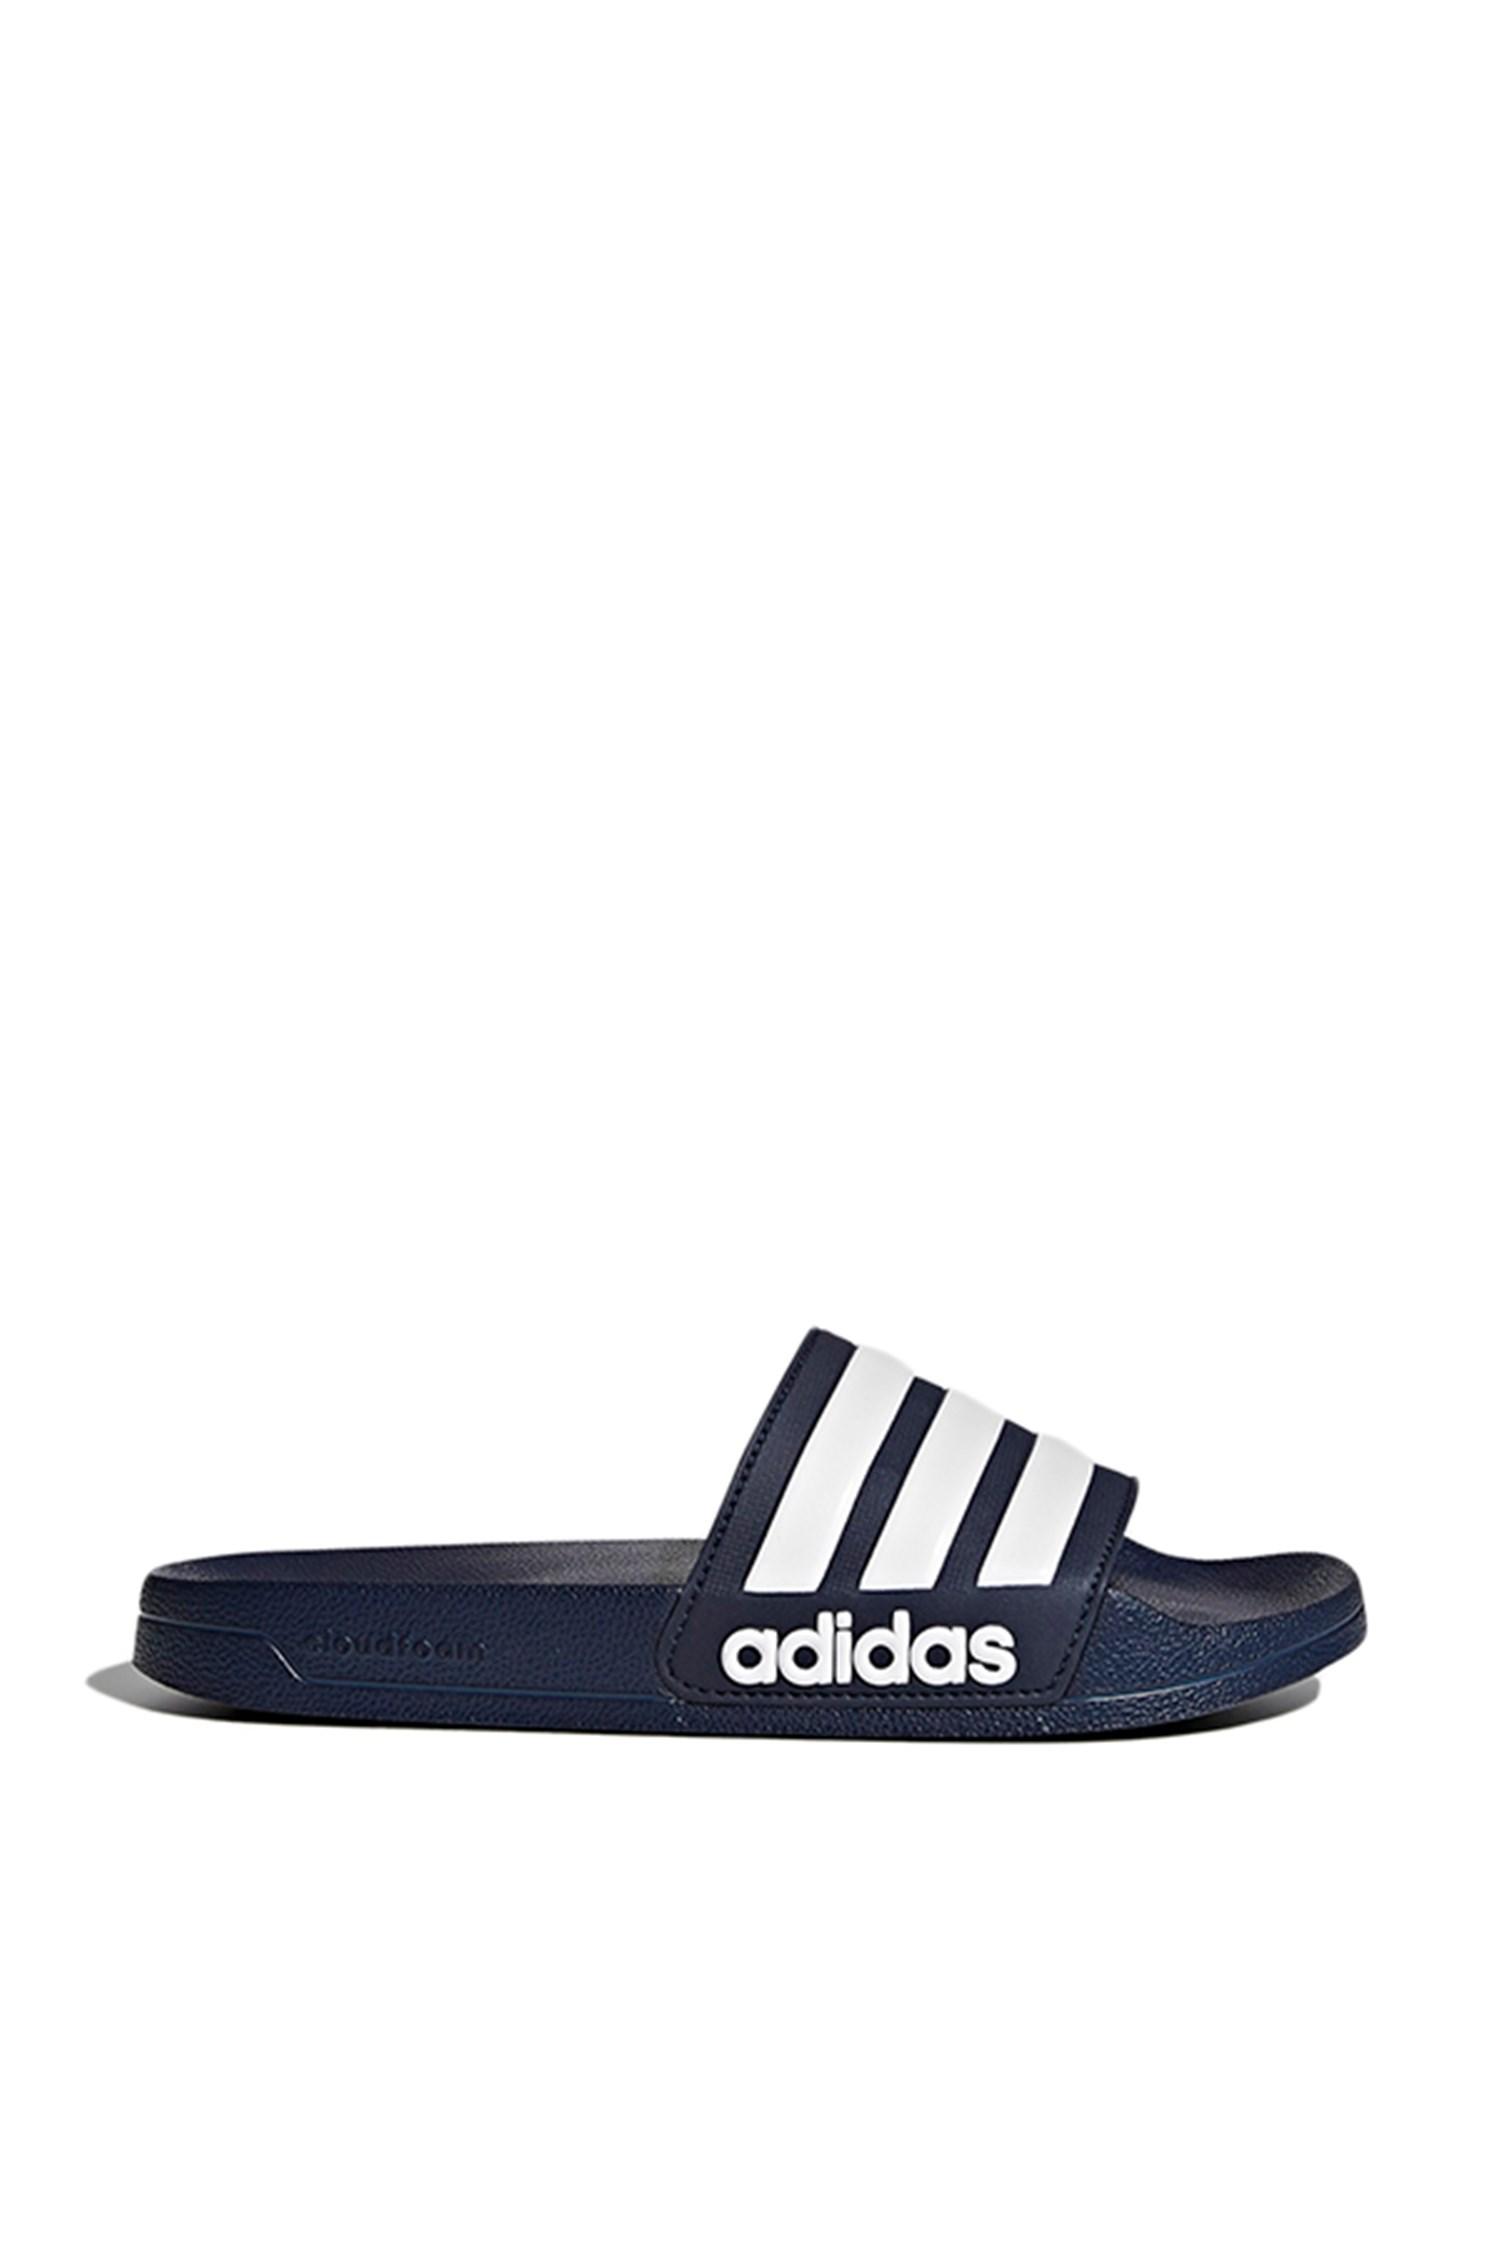 Adidas Low shoes Slipper Man